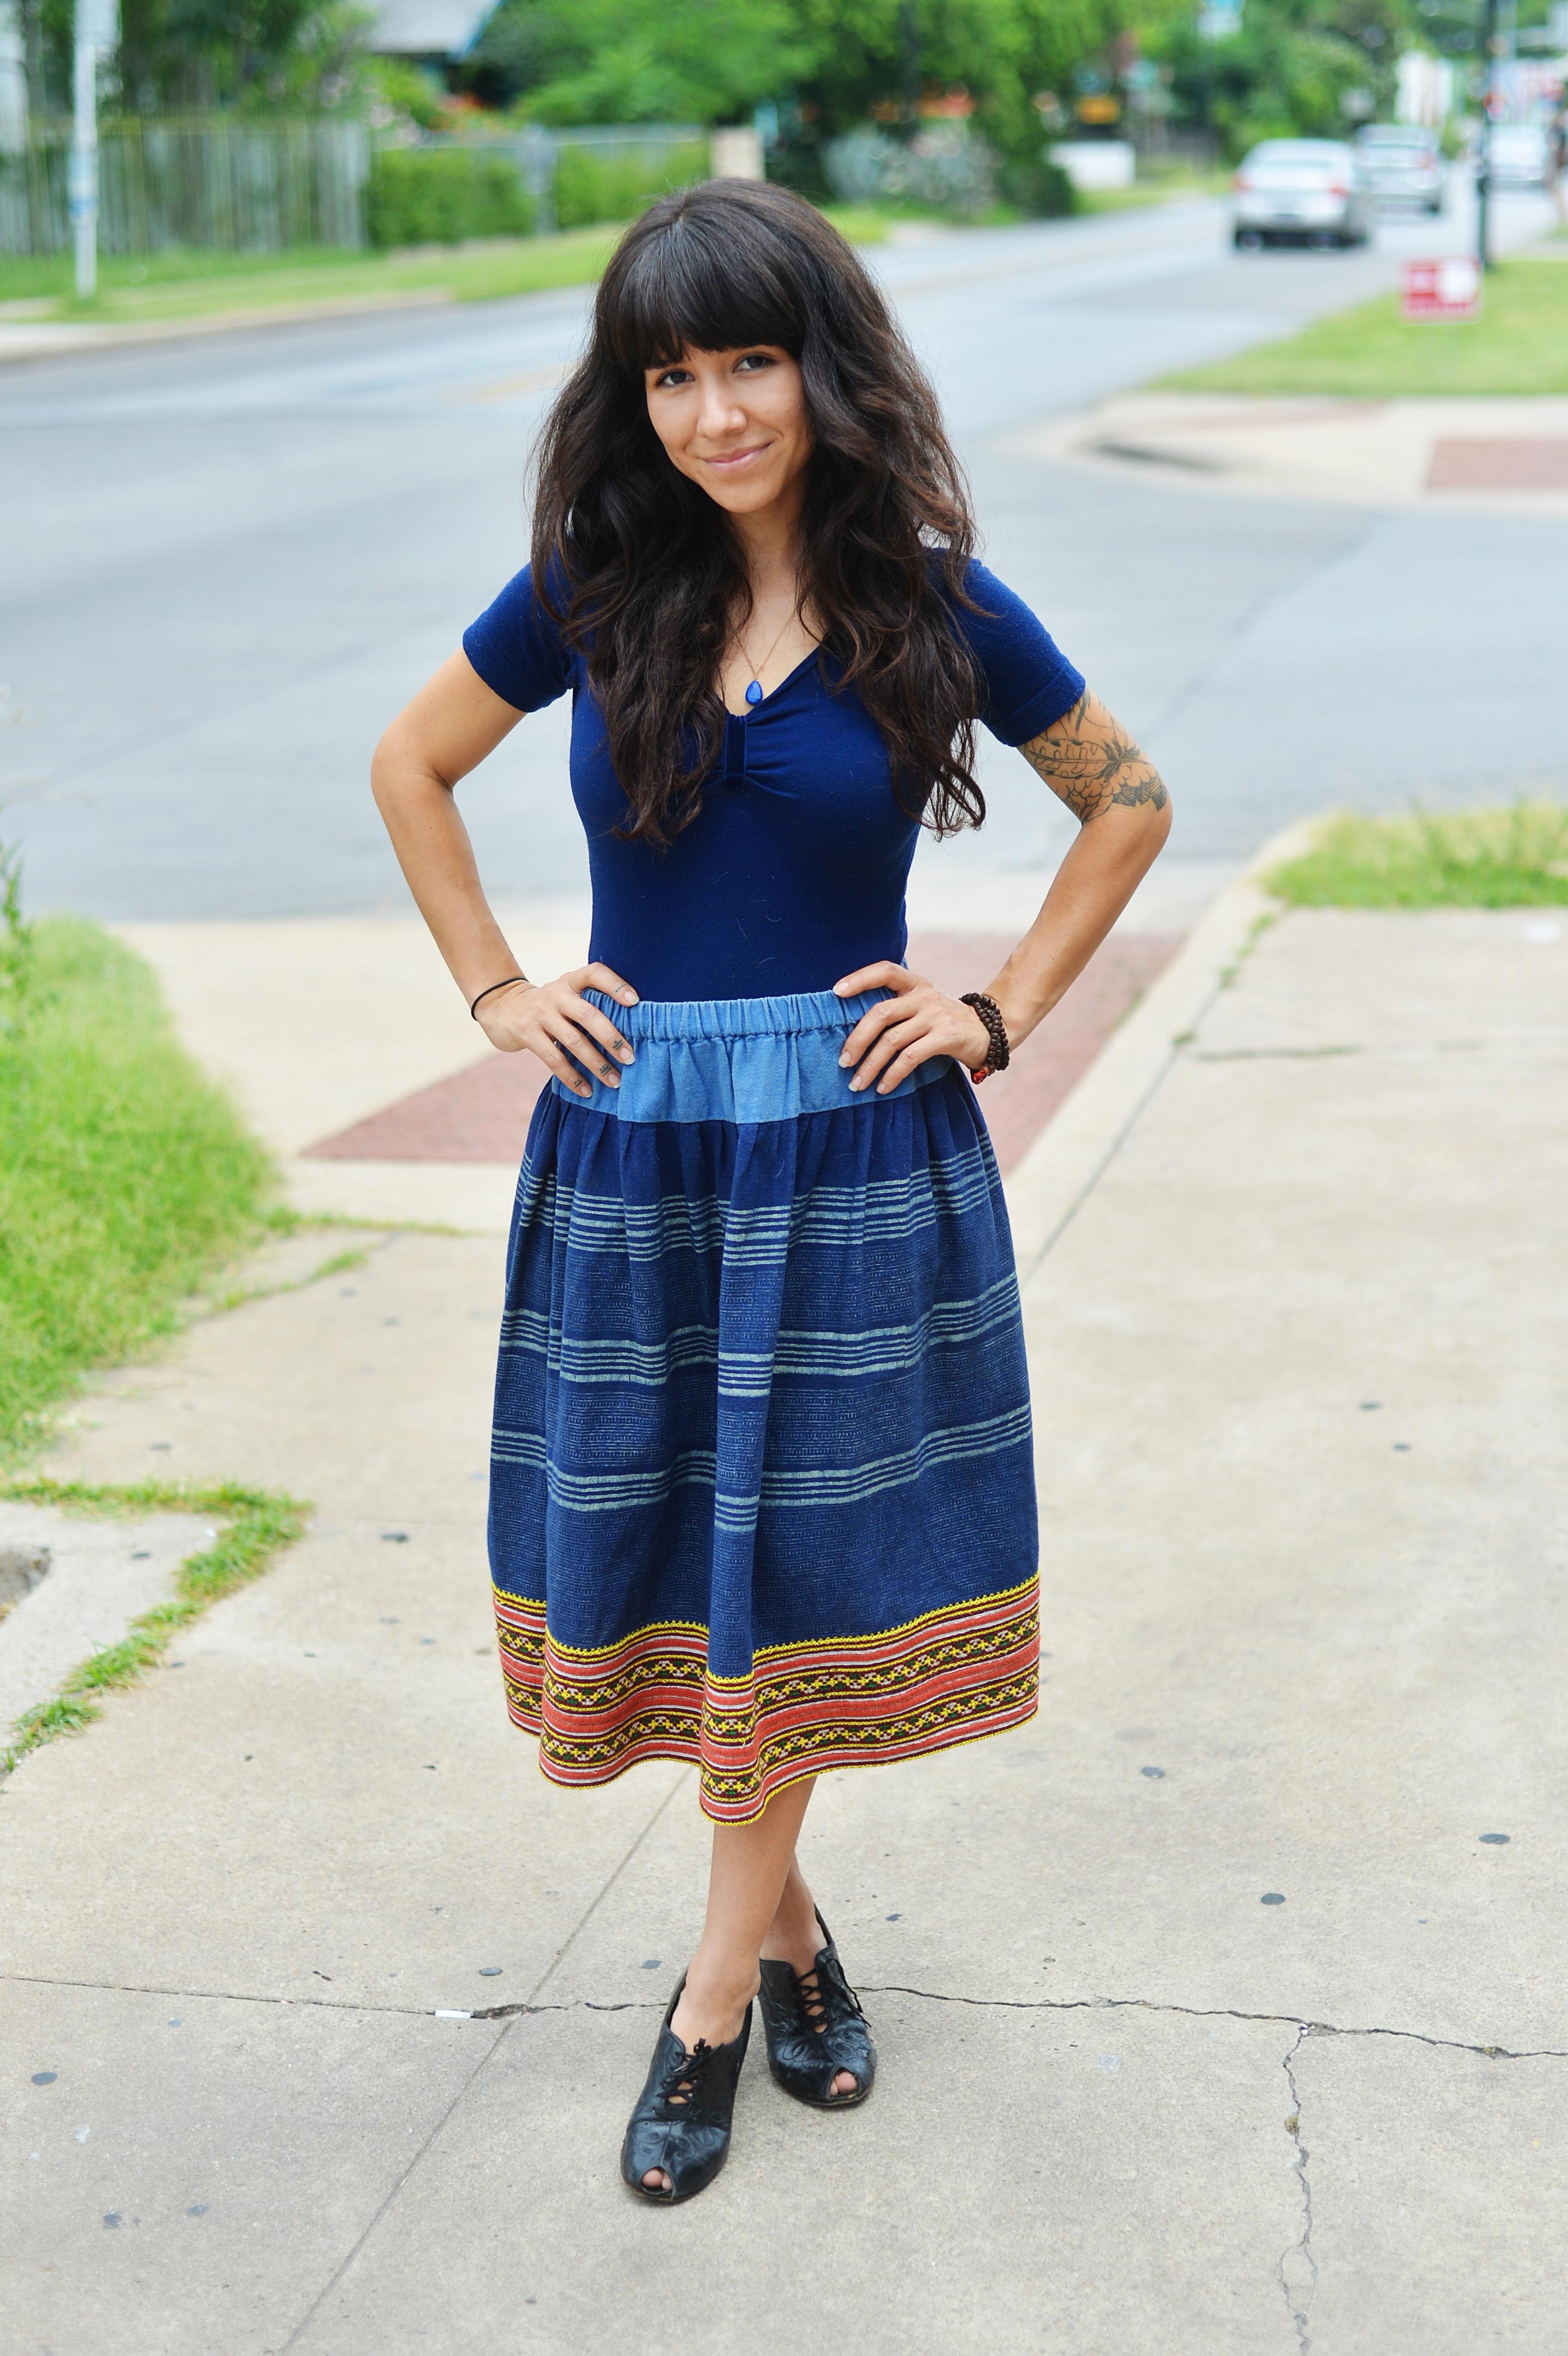 8cc0c2d258 Street Style Pic of the Week  Tamara Valdez - Keep Austin Stylish